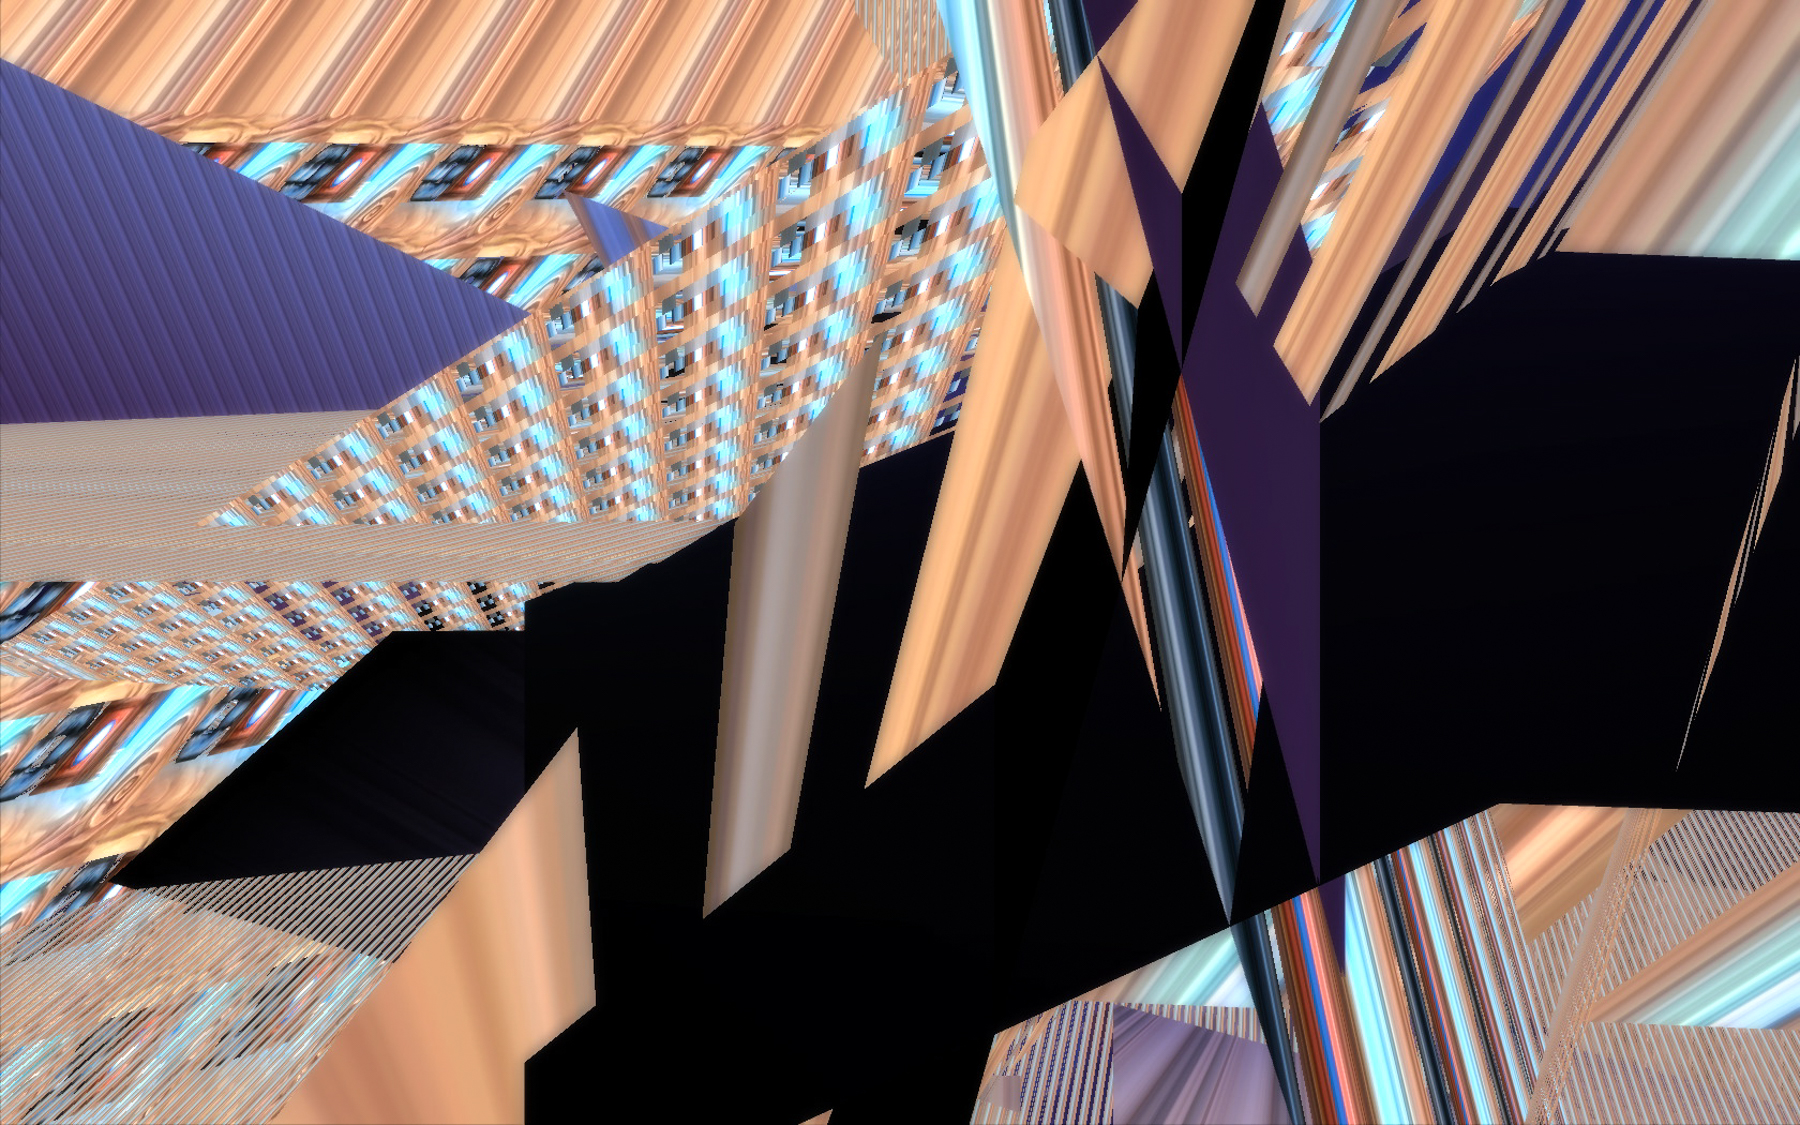 Eron Rauch - Glitchscapes-7.jpg